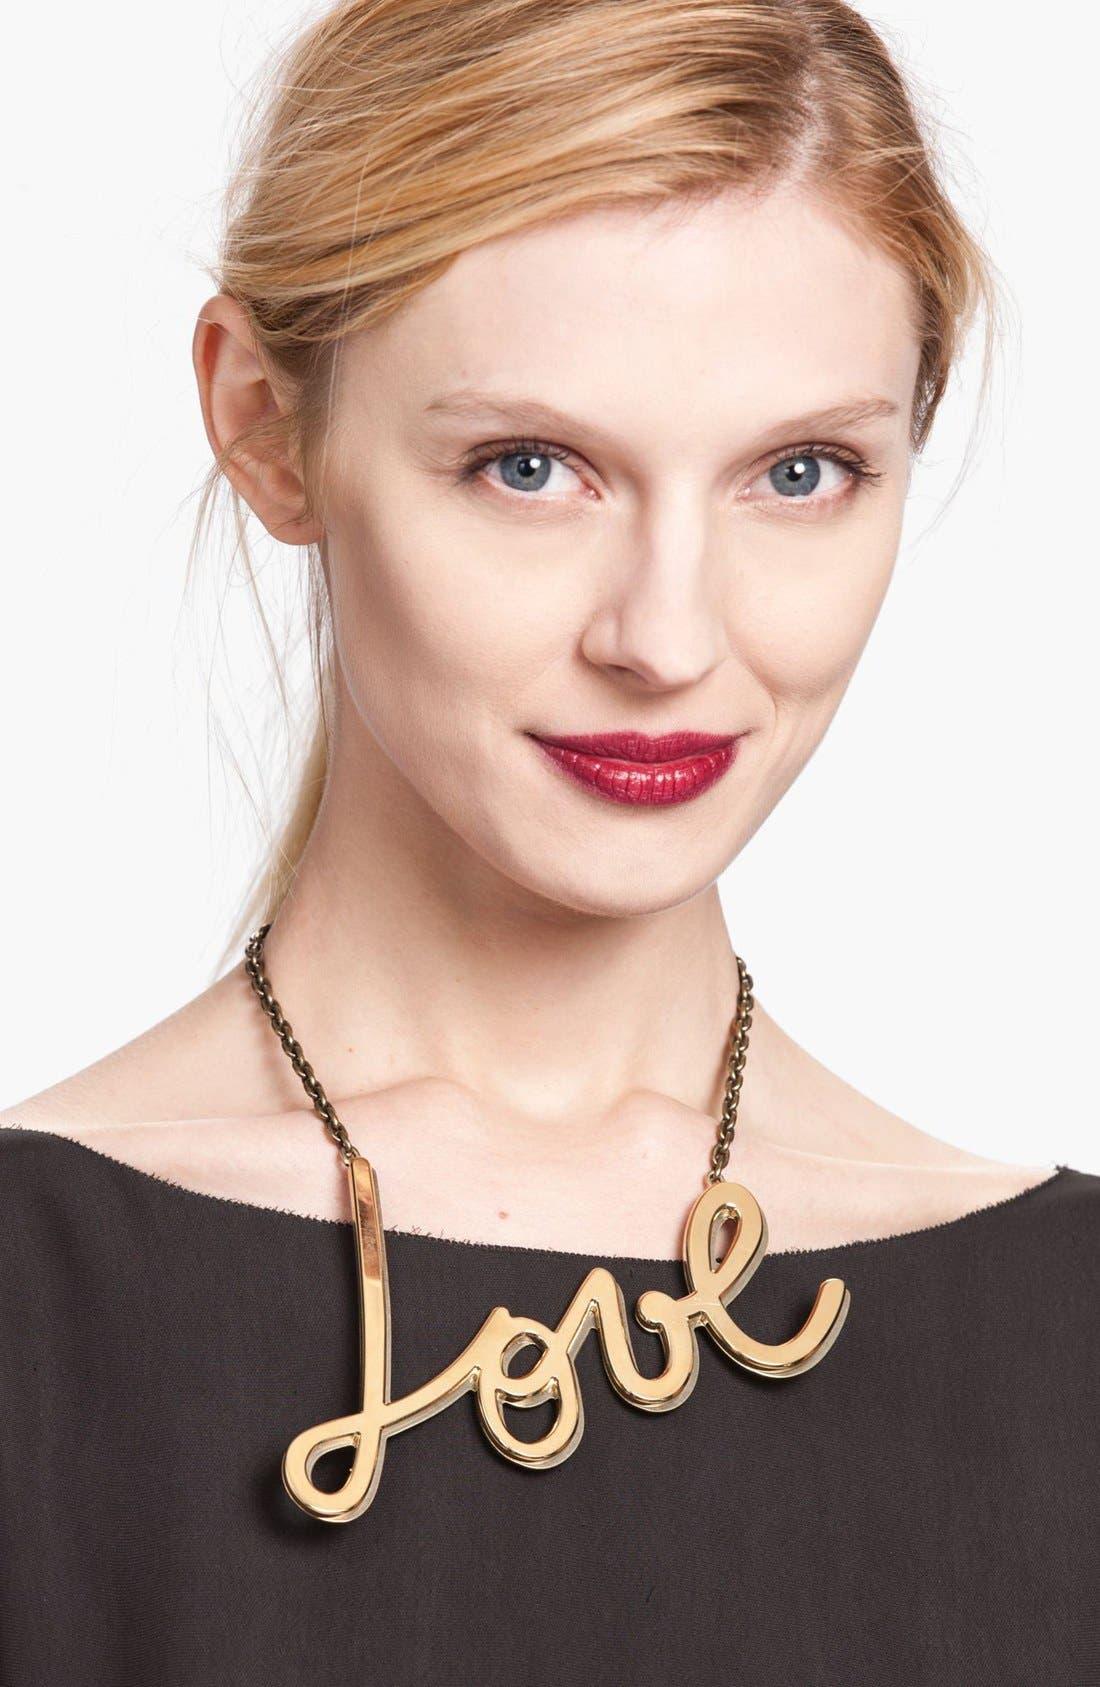 Main Image - Lanvin 'Love' Chain Necklace